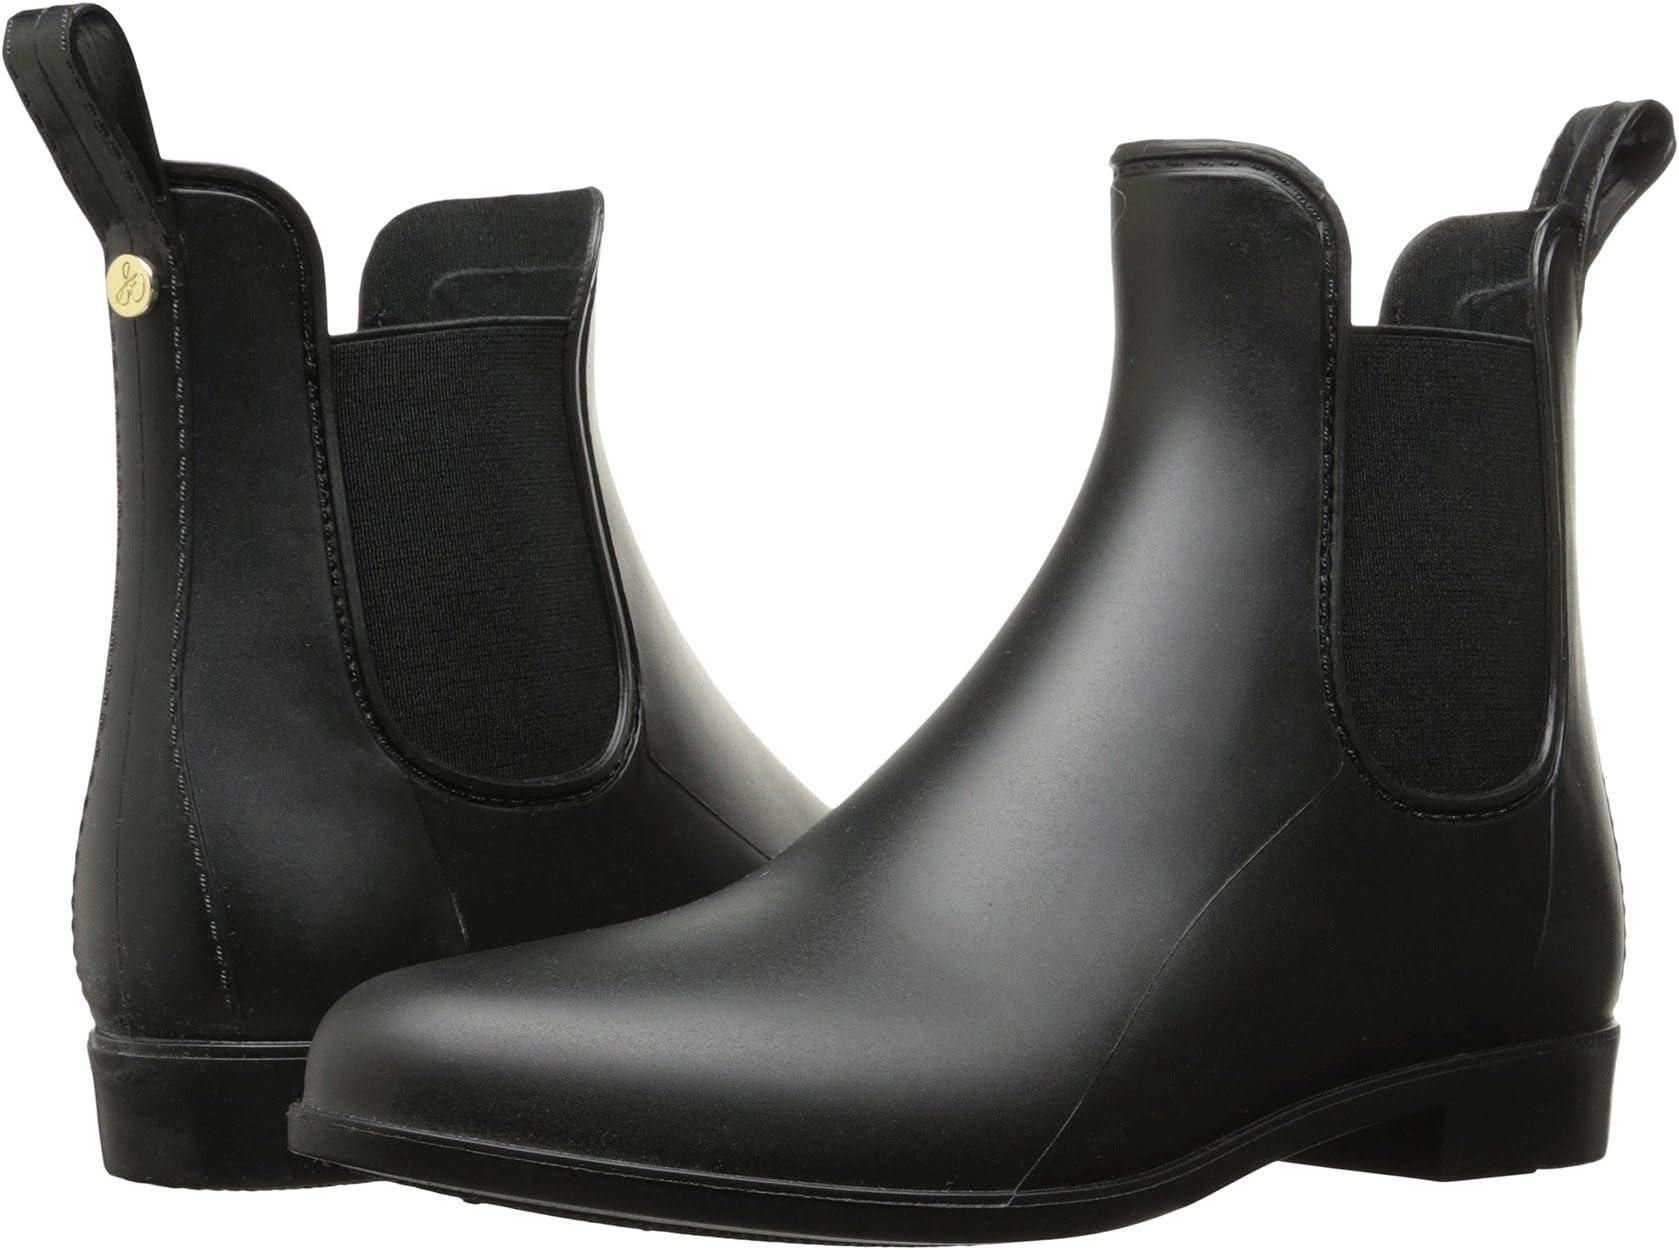 a5c40cac5 Sam Edelman Boots